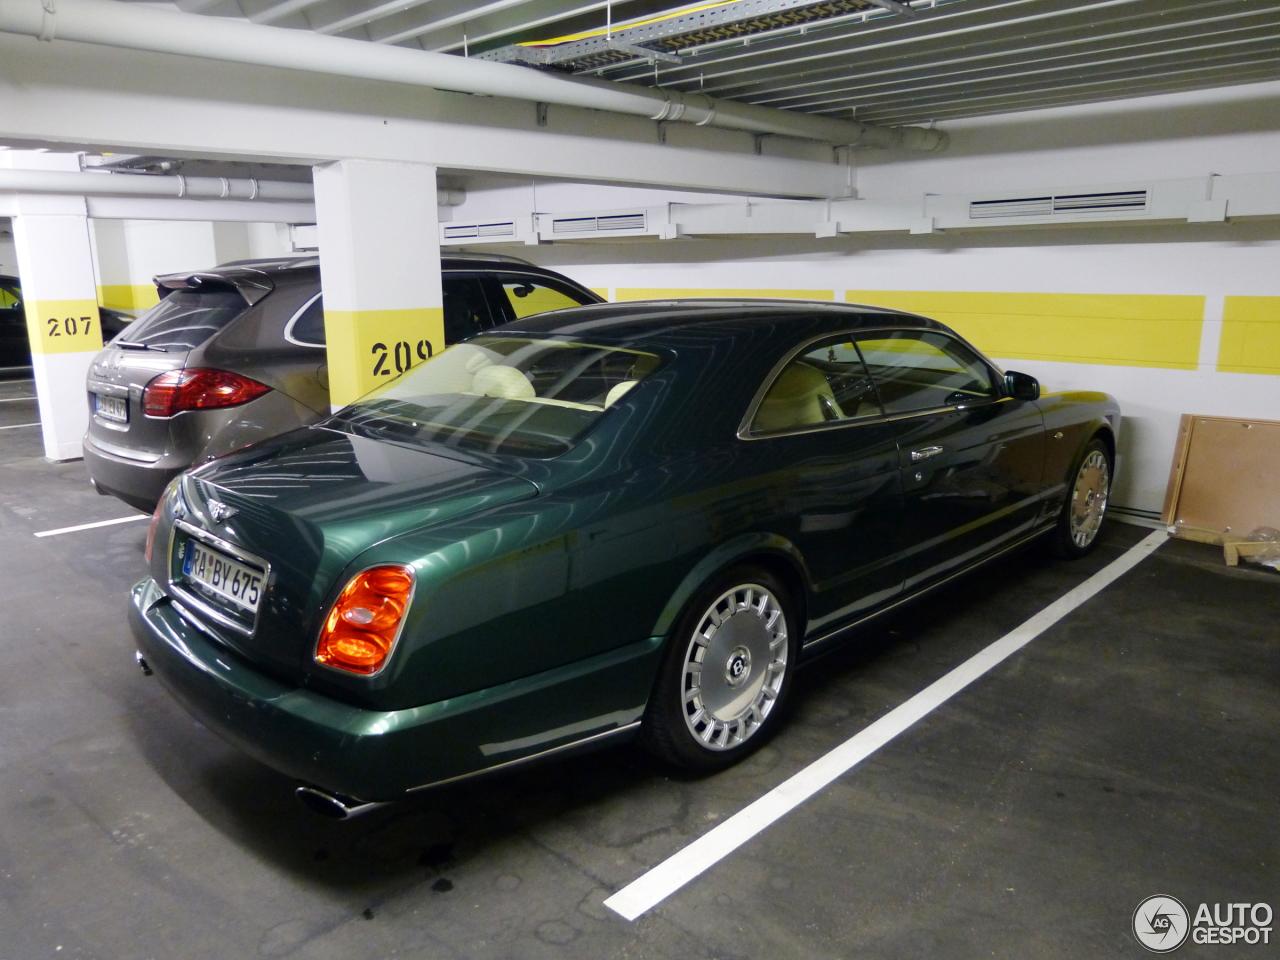 Bentley Brooklands 2008 16 May 2015 Autogespot